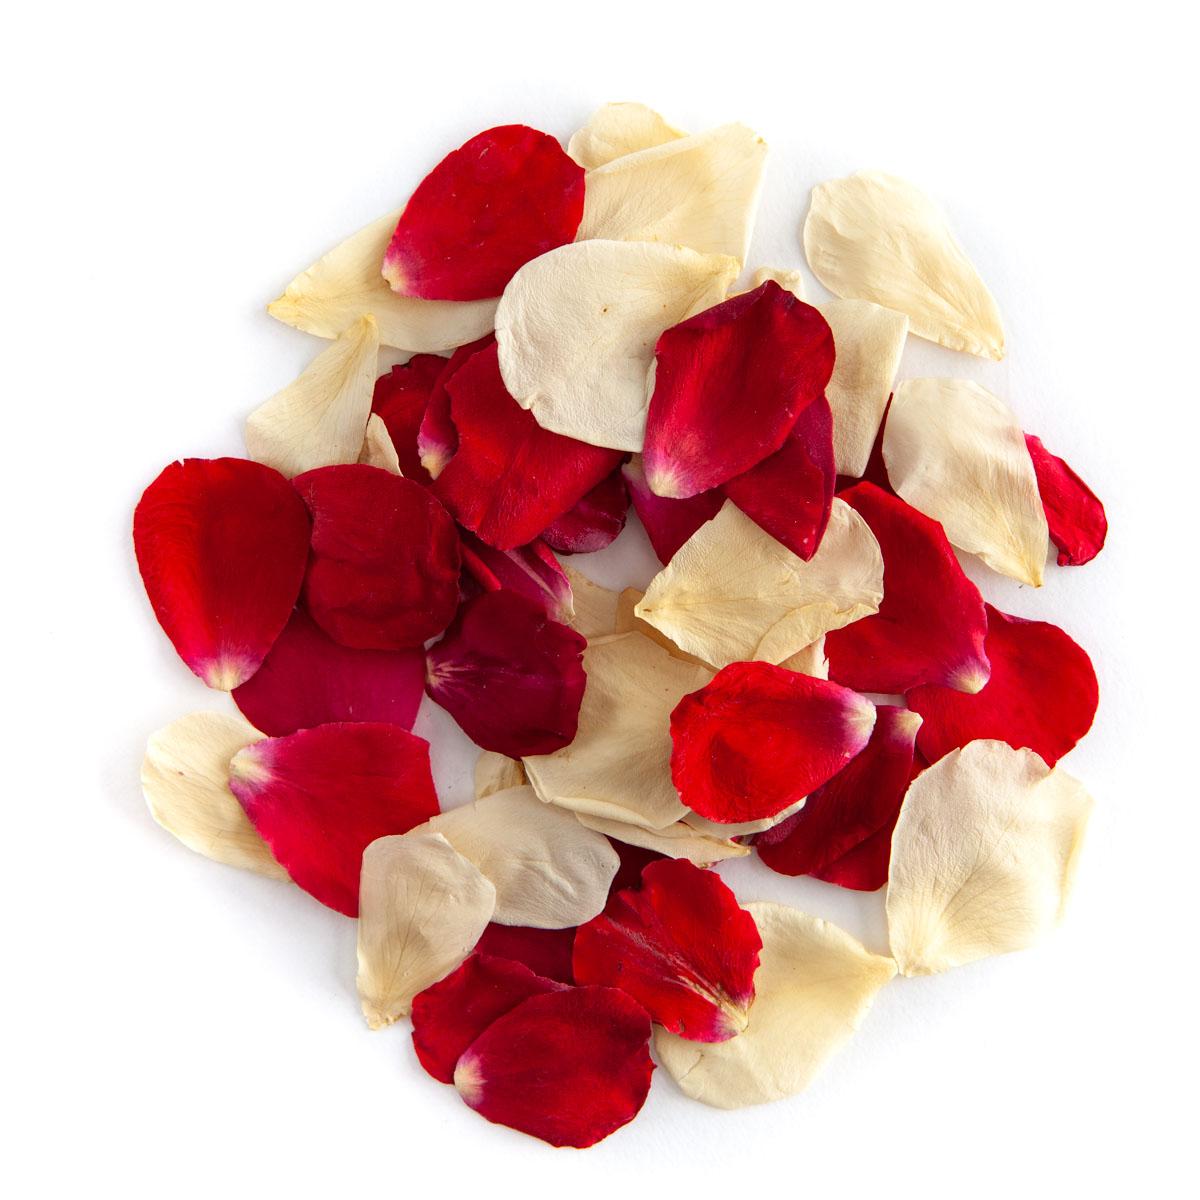 Red & Cream rose petals - Biodegradable Rose Petal Confetti - Real Flower Petal Confetti